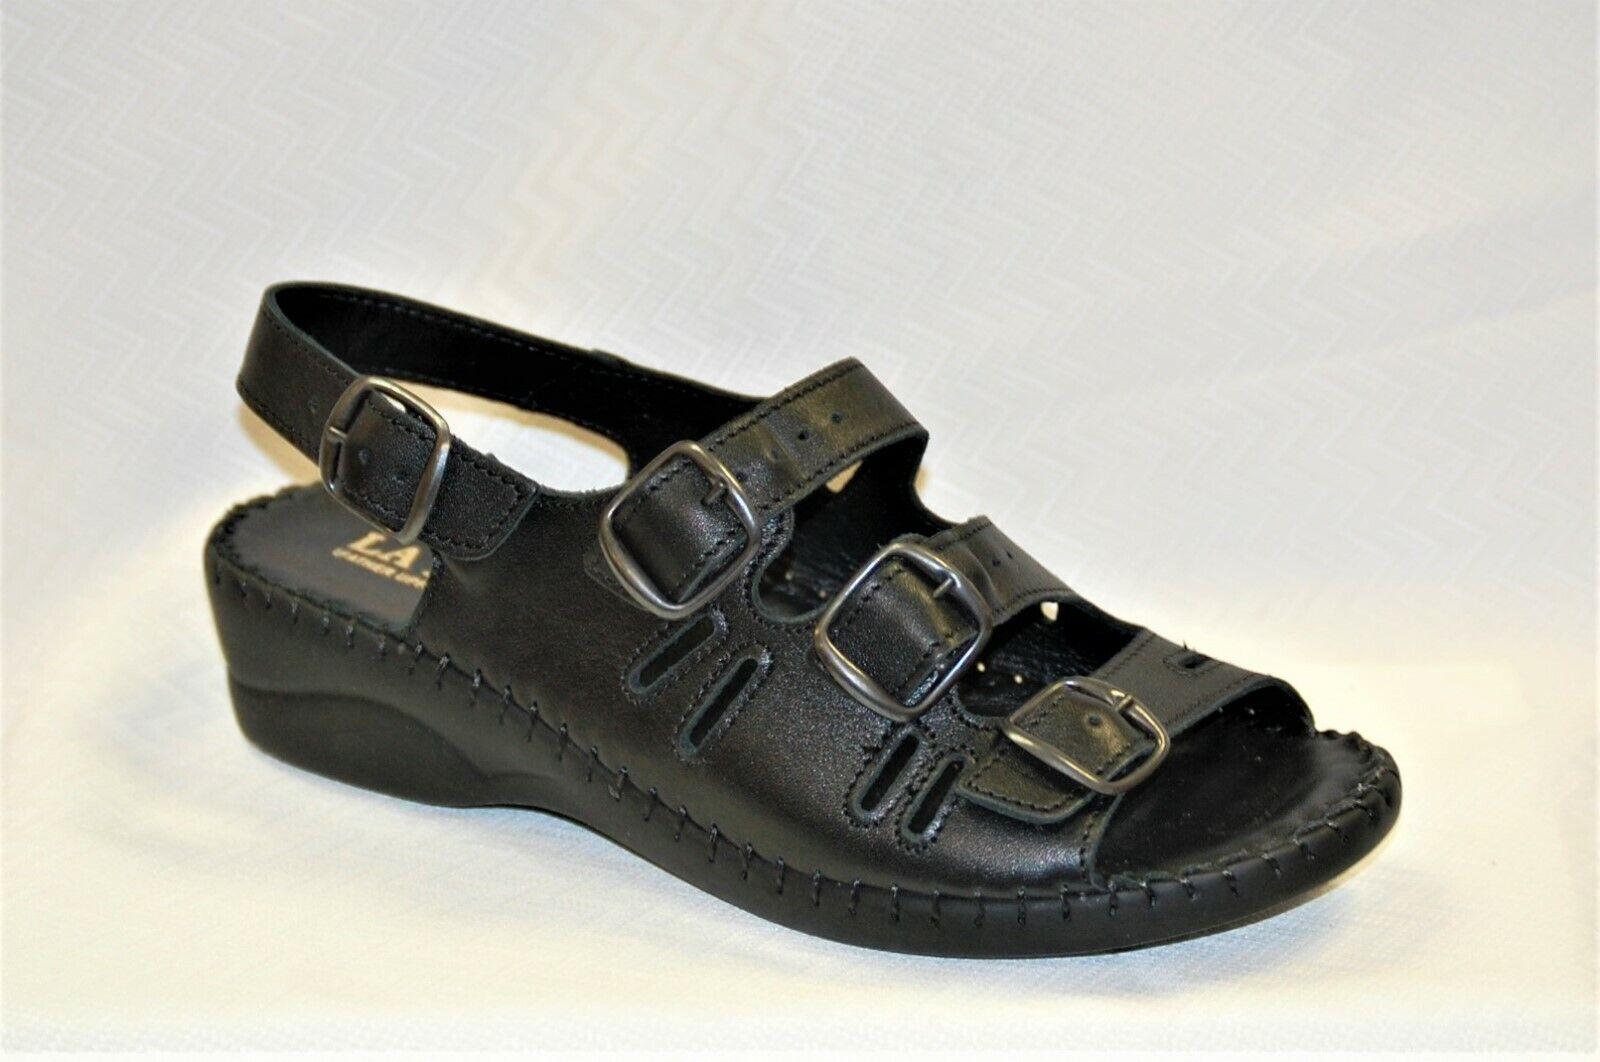 La Plume Blazer Women's Women's Women's BLACK  wedge sandal with adjustable straps SIZE 40 d054f2